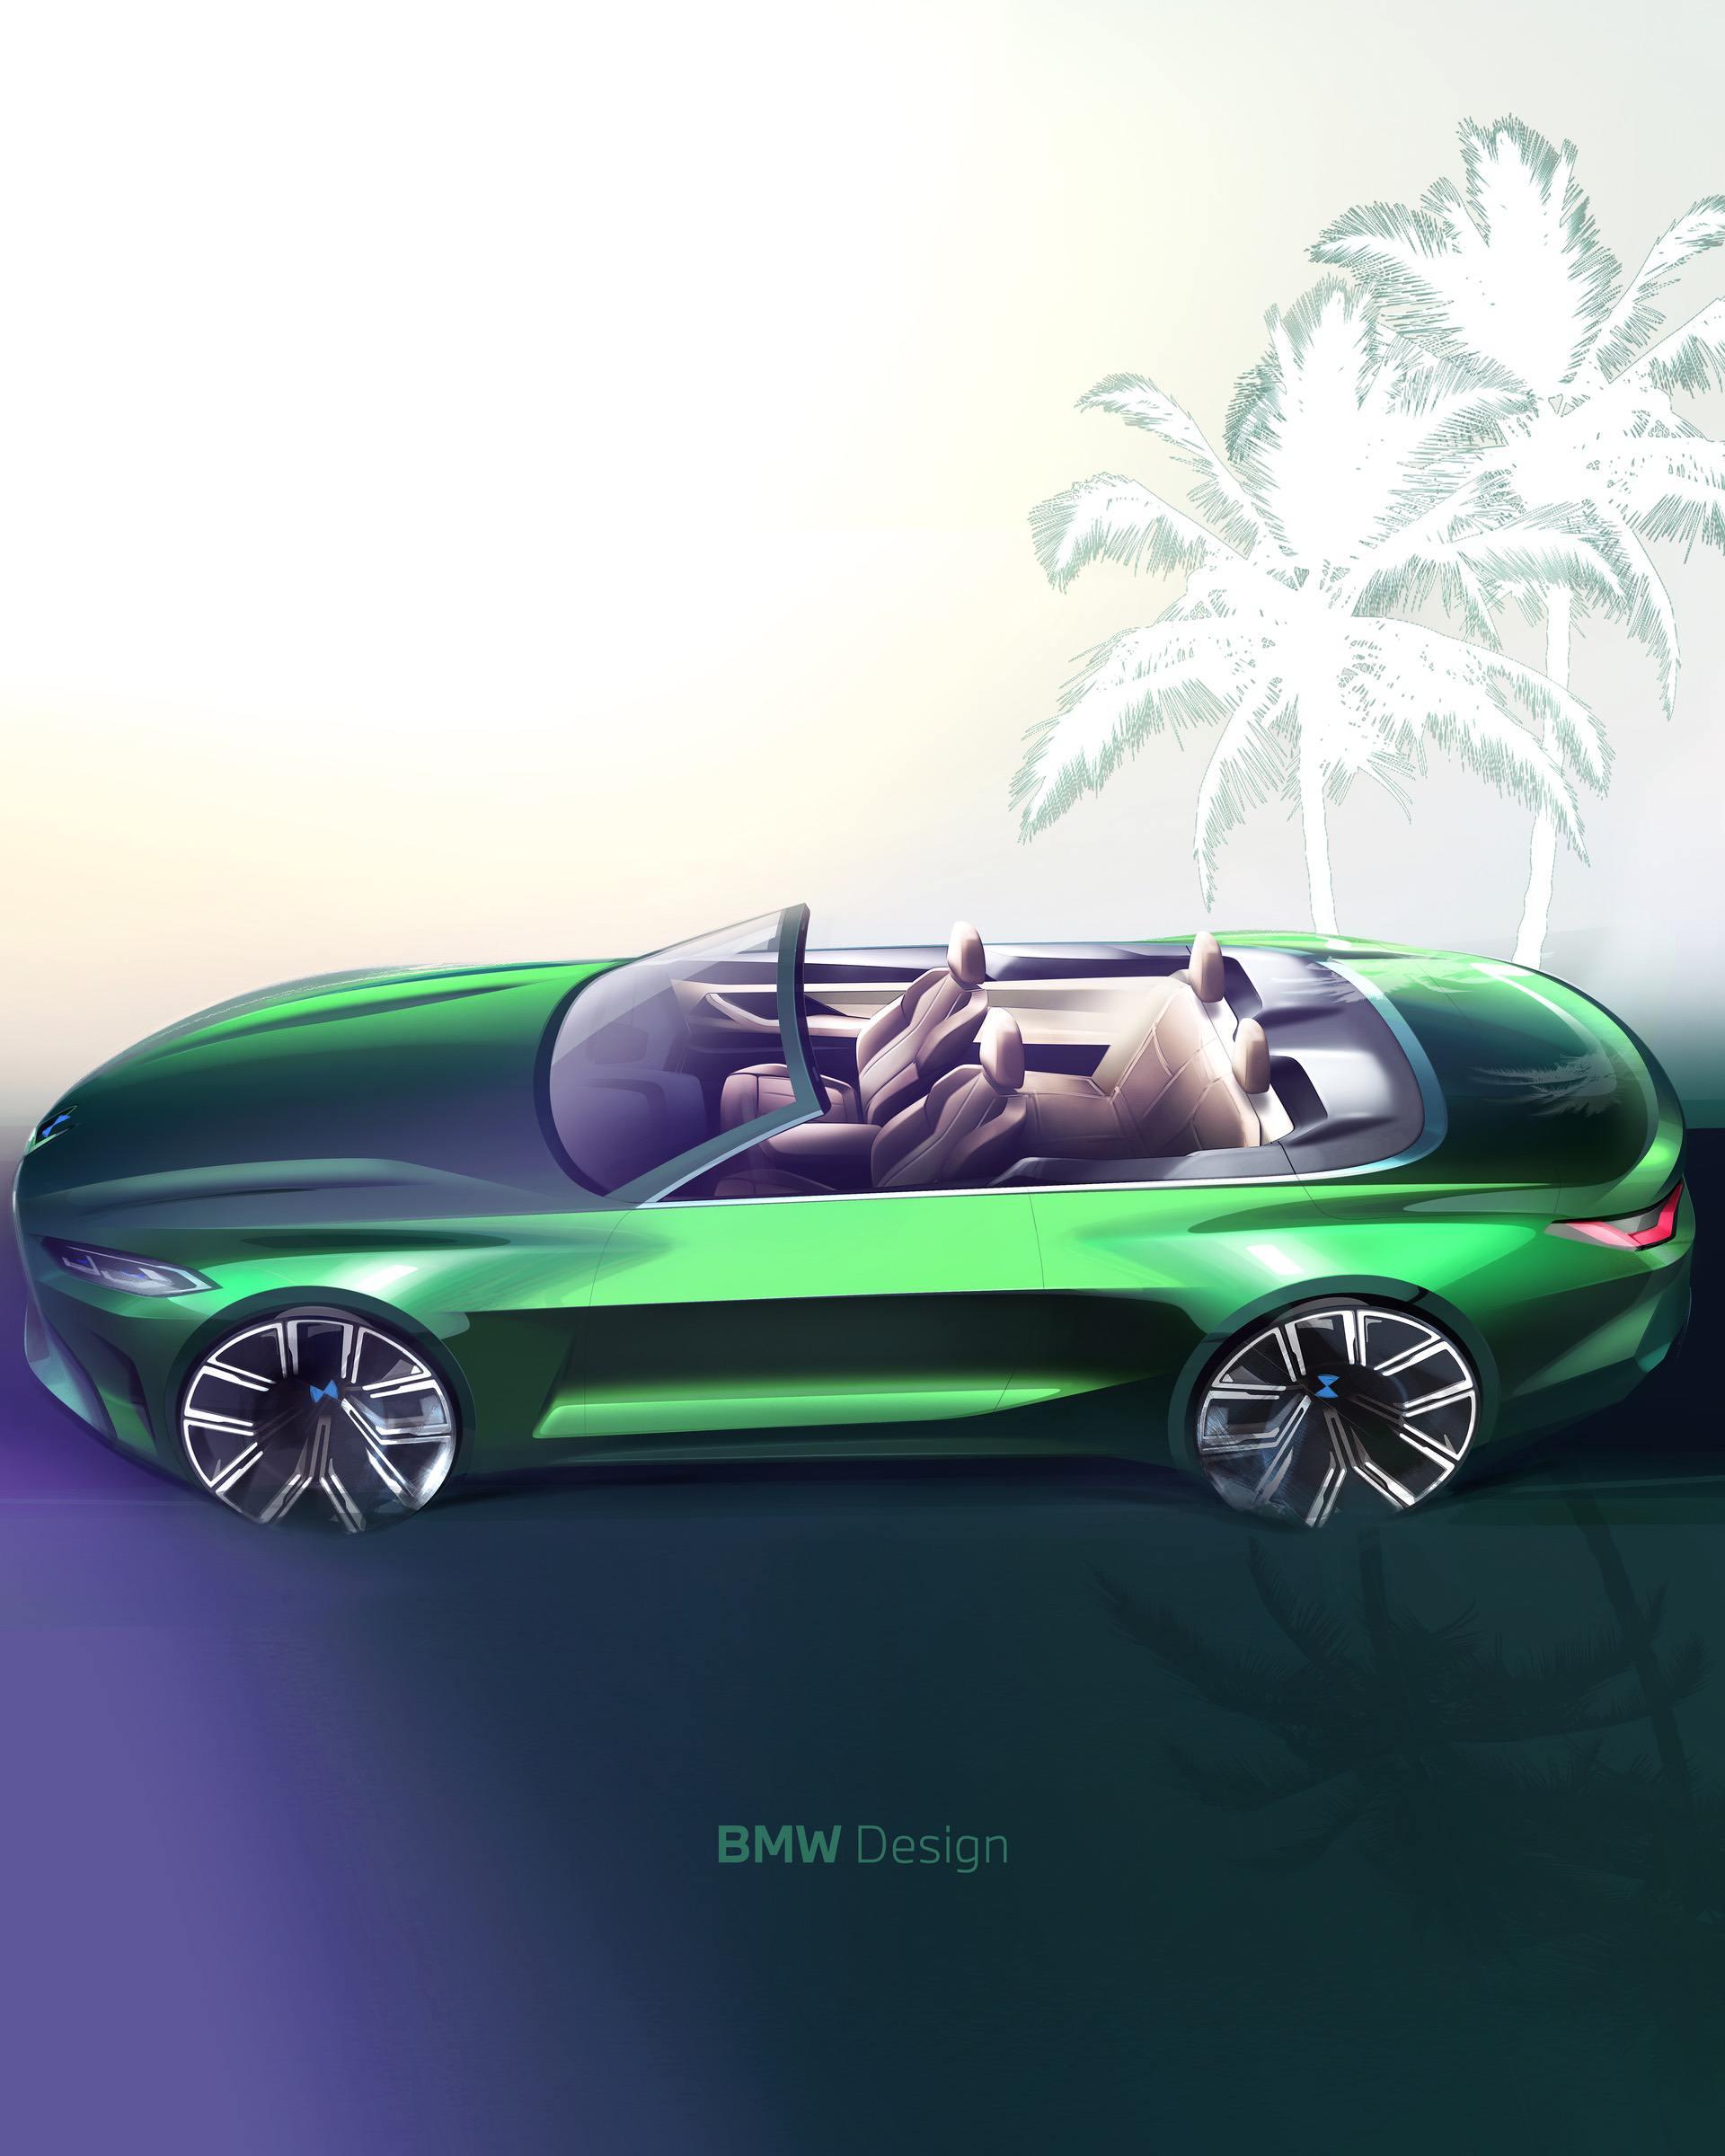 2021 bmw 4 series convertible design 02